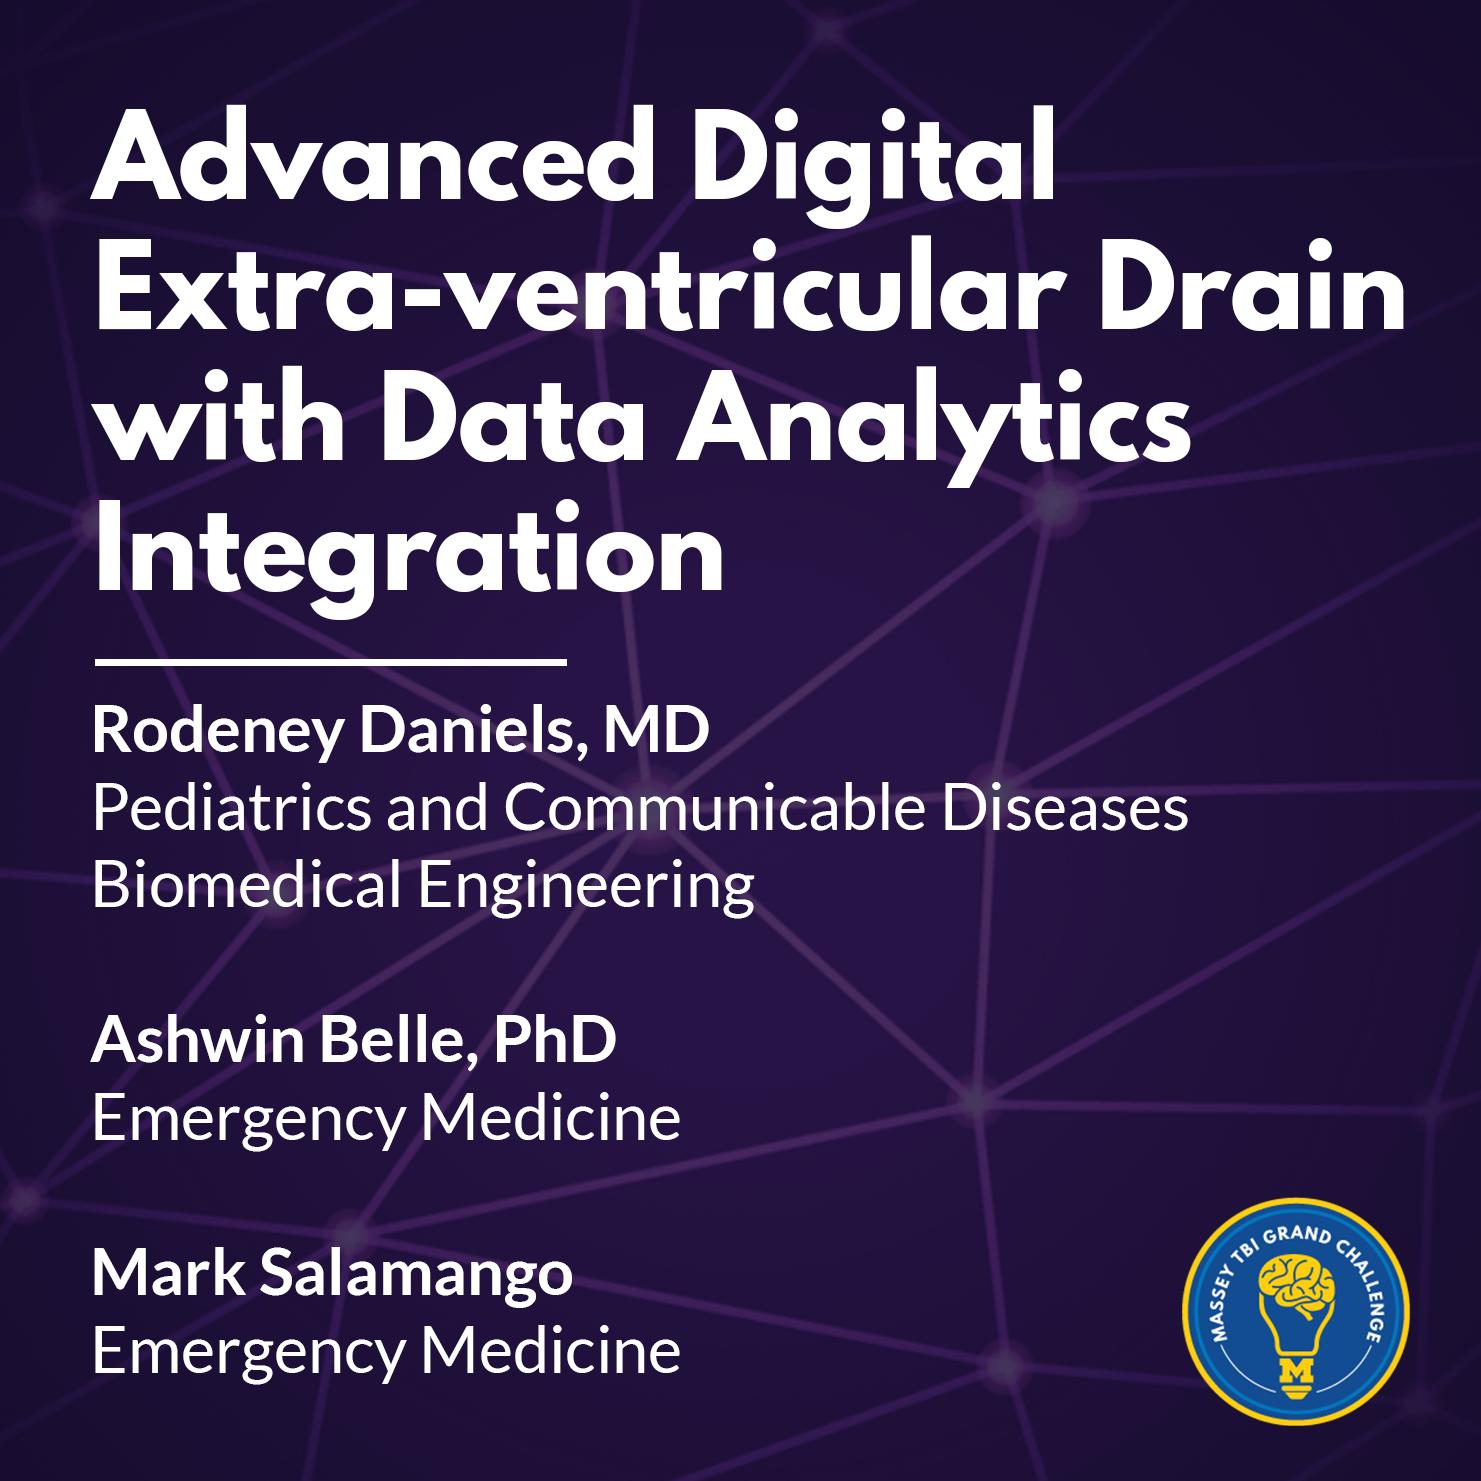 Advanced Digital Extra-ventricular Drain.png